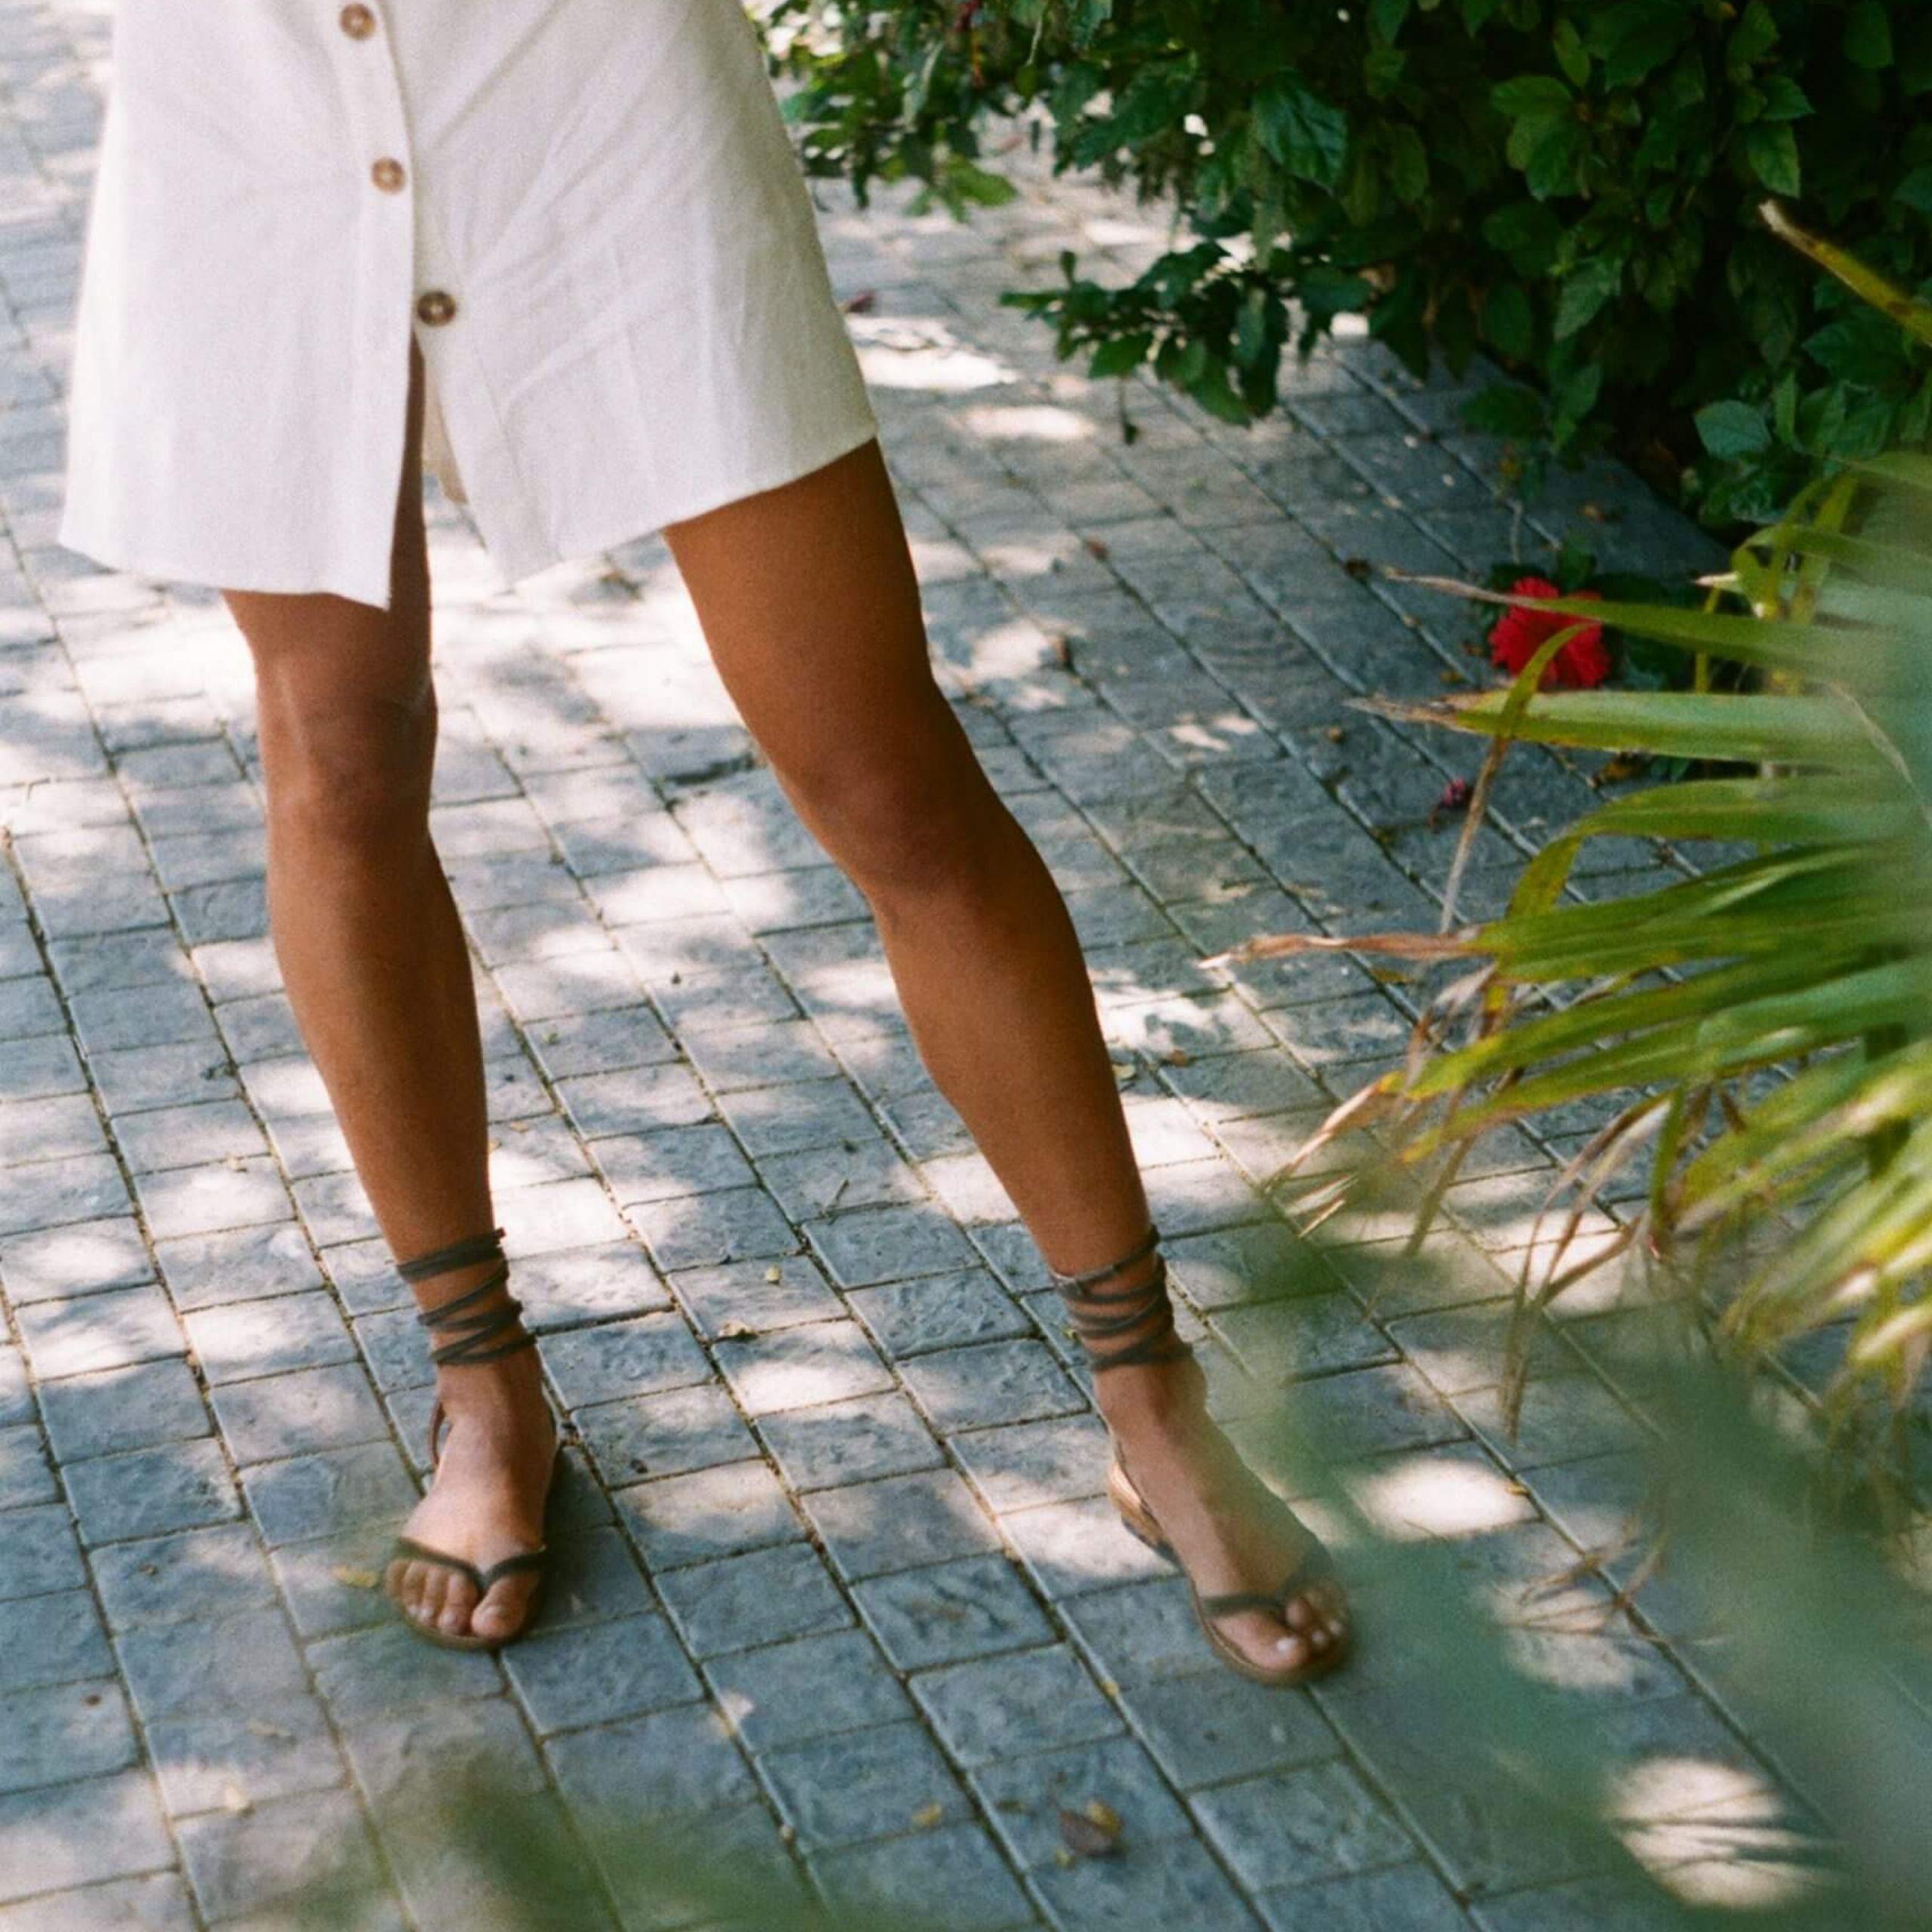 sierra-1_lintsandalen sandals travelsandals vegan sustainable sandals wikkelsandalen